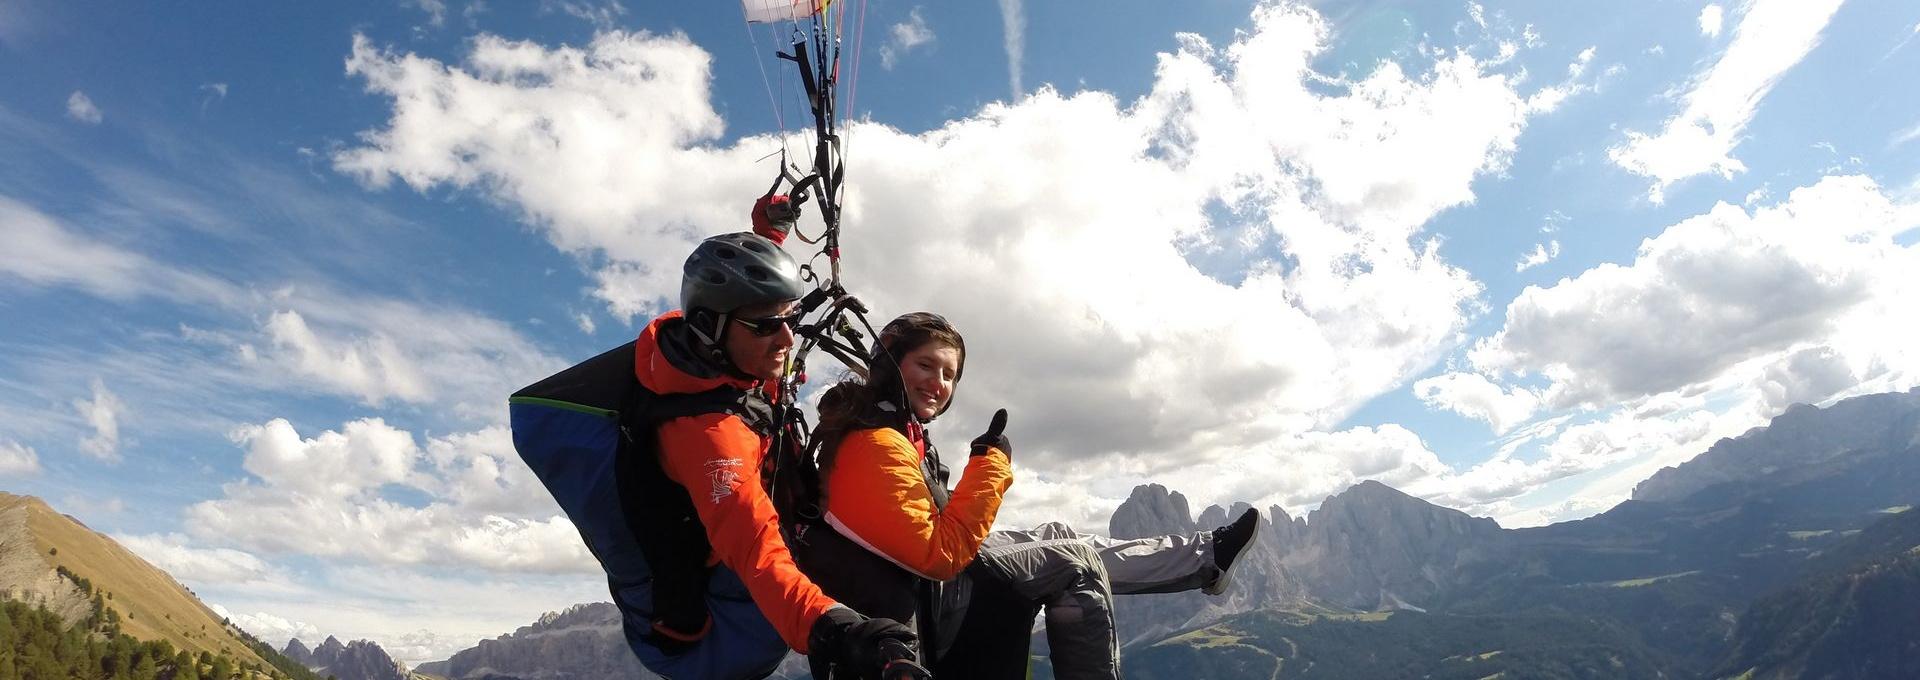 Val Gardena - Paragliding Tandemfly